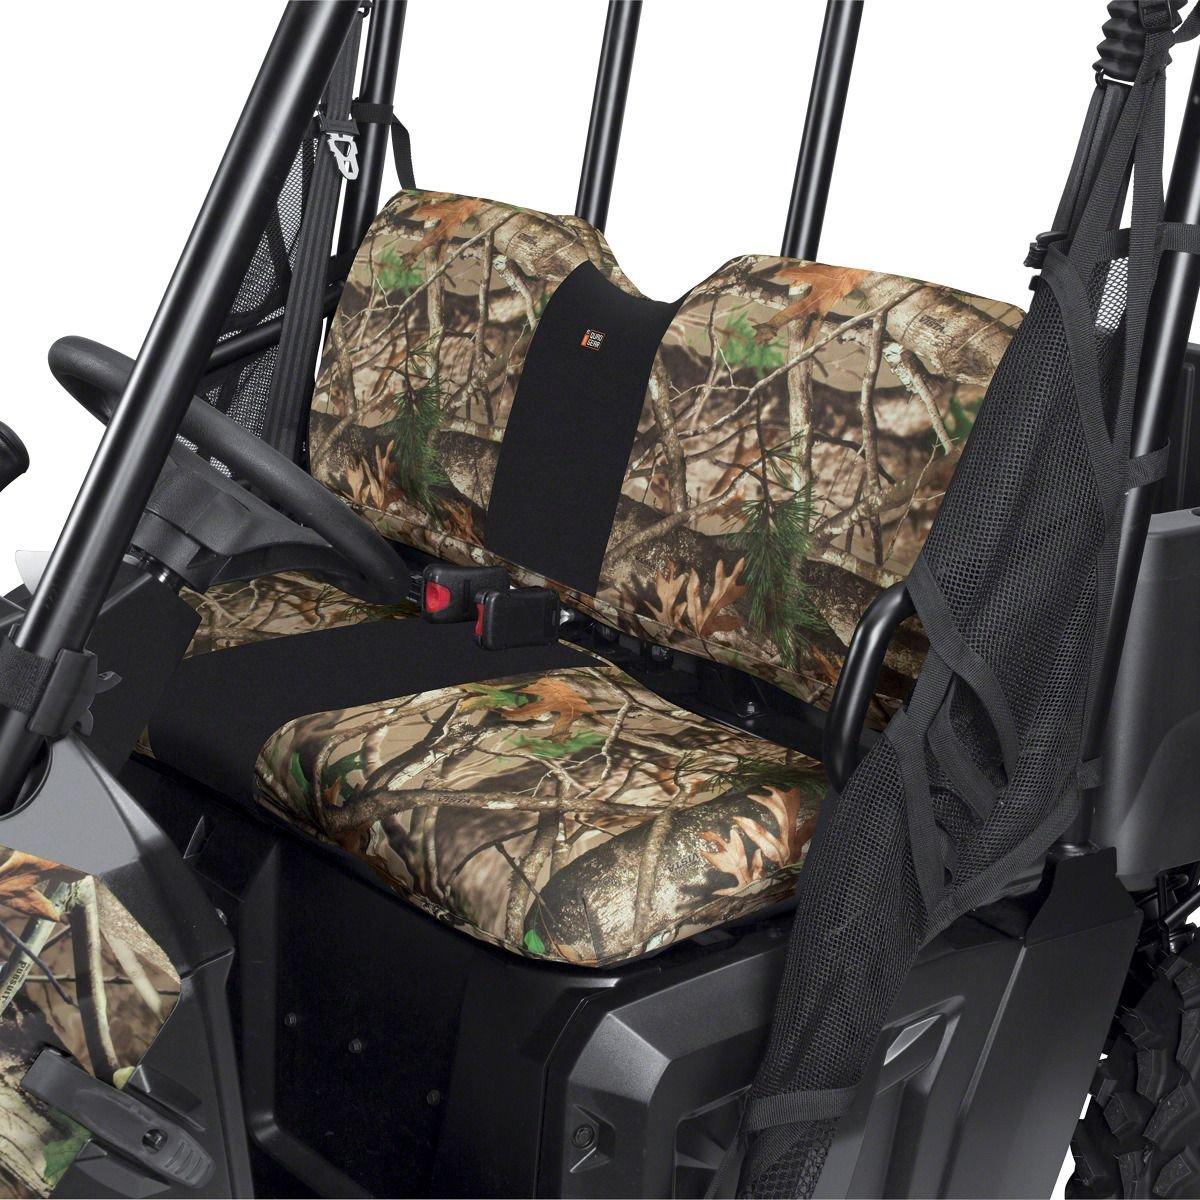 Classic Accessories UTV Seat Covers-Next Vista G1-Polaris Ranger '02-'08 by Classic Accessories